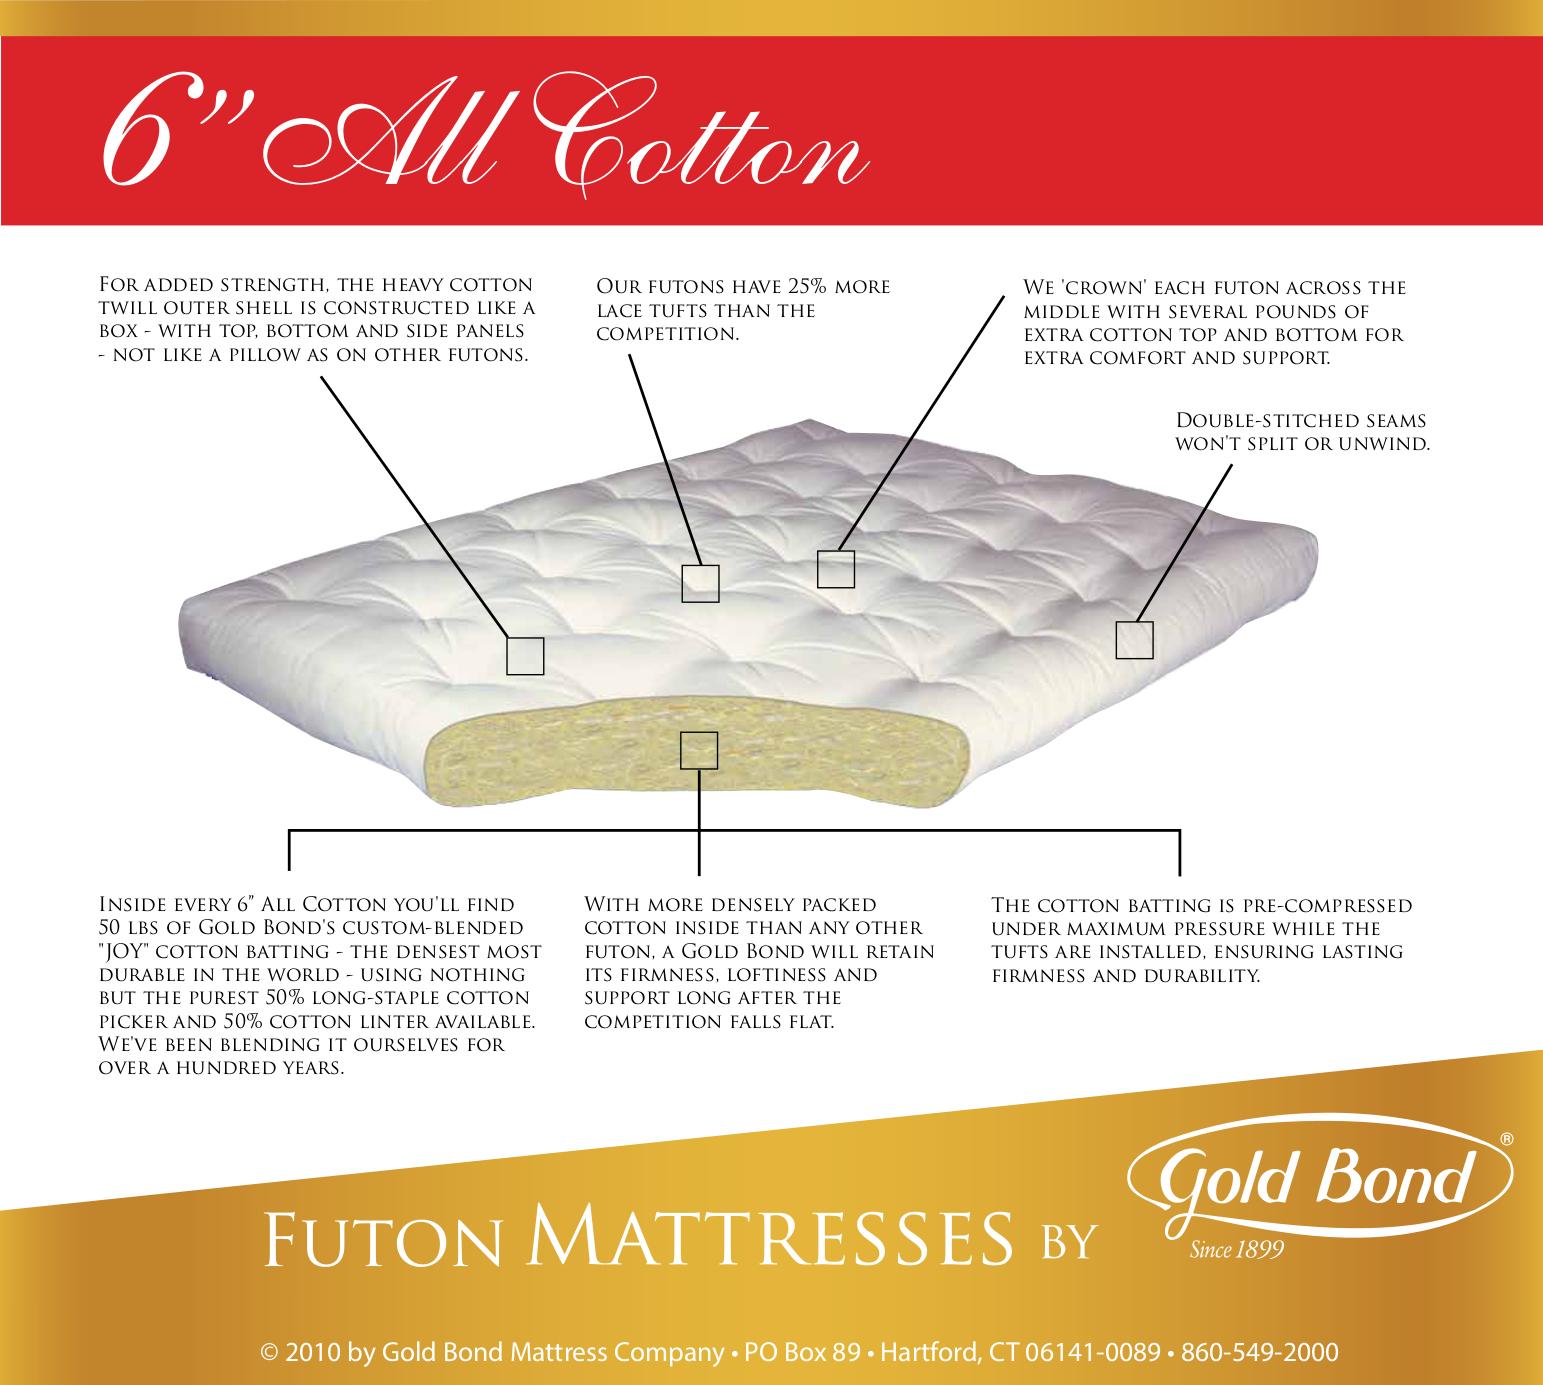 6 Inch All Cotton